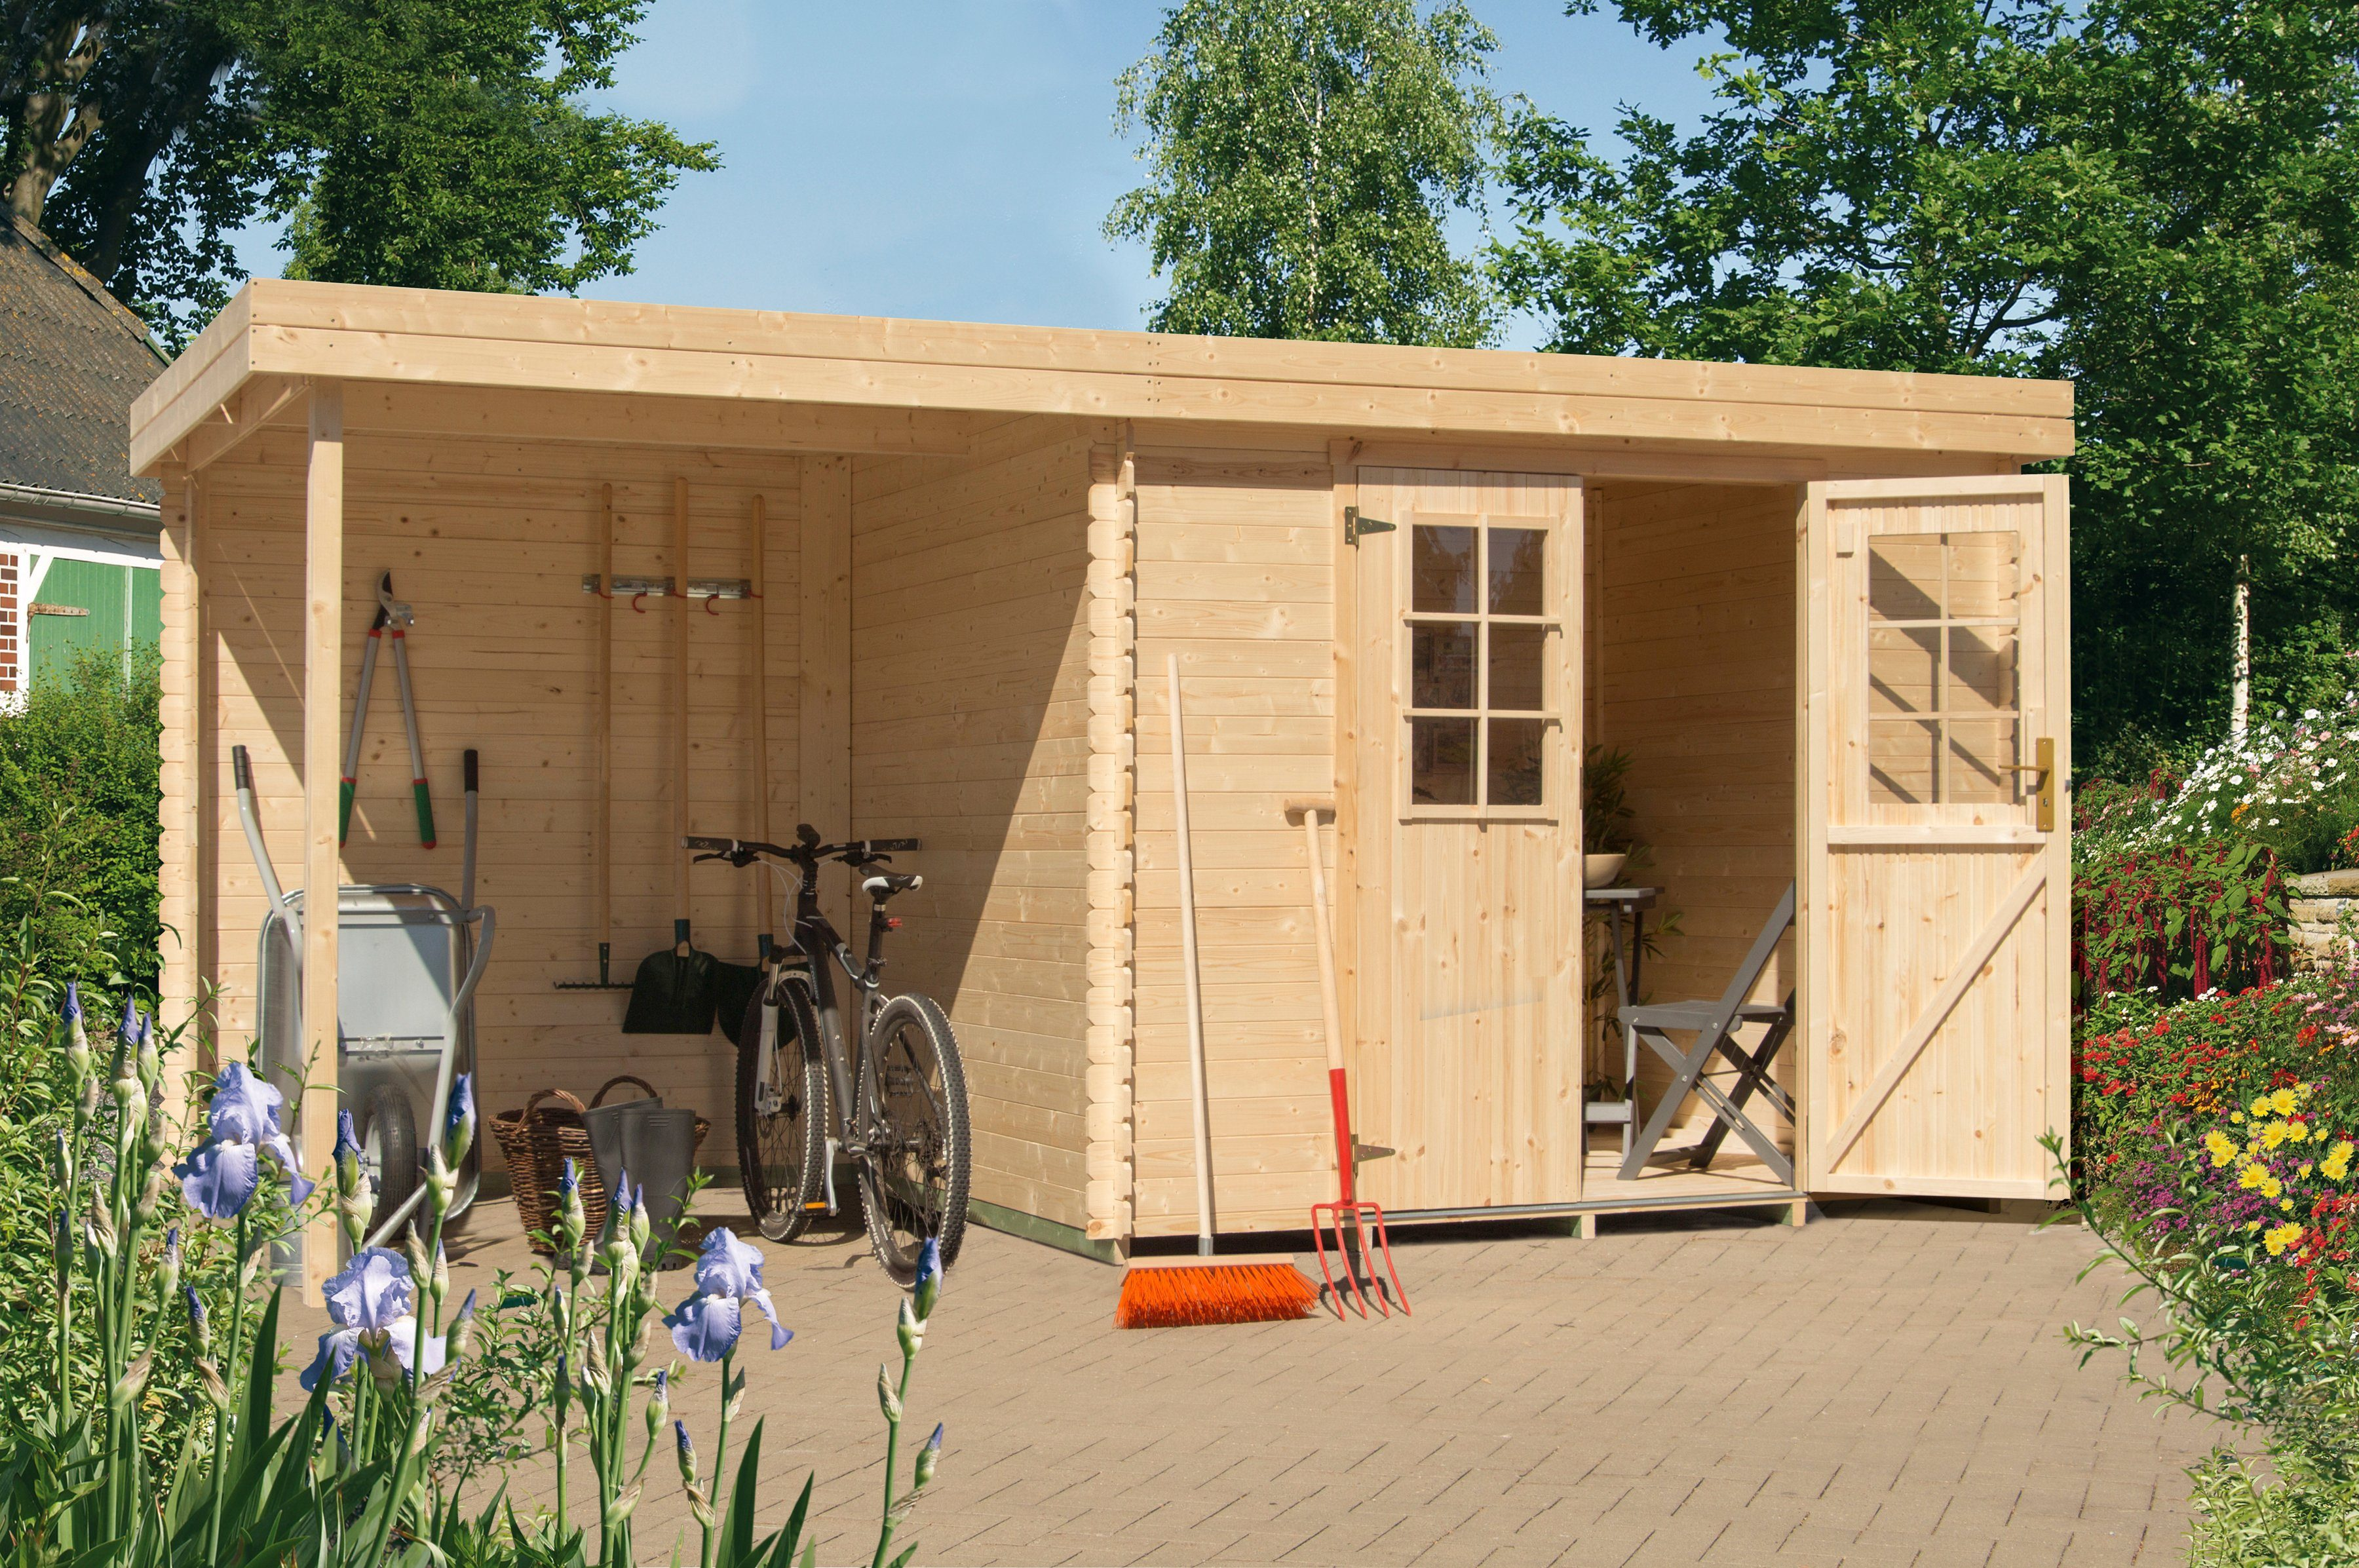 Gartenhaus Ohne Fußboden Aufbauen ~ Gartenhaus mit aufbau attraktiv aufbau gartenhaus ohne boden